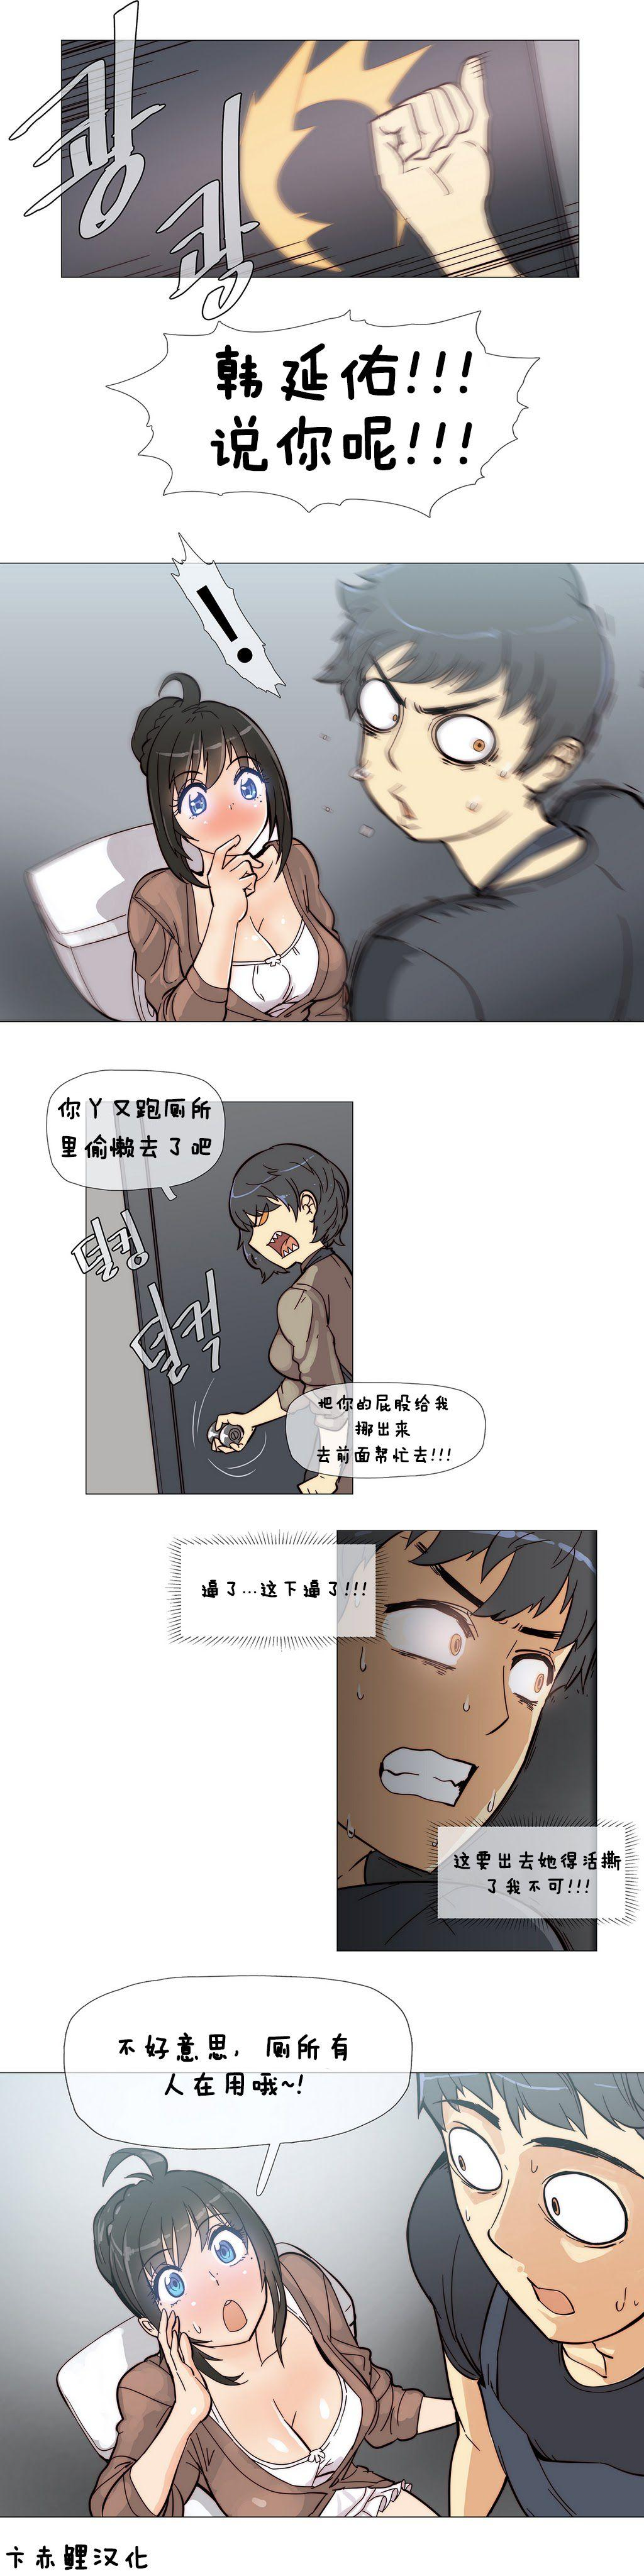 HouseHold Affairs 【卞赤鲤个人汉化】1~33话(持续更新中) 75